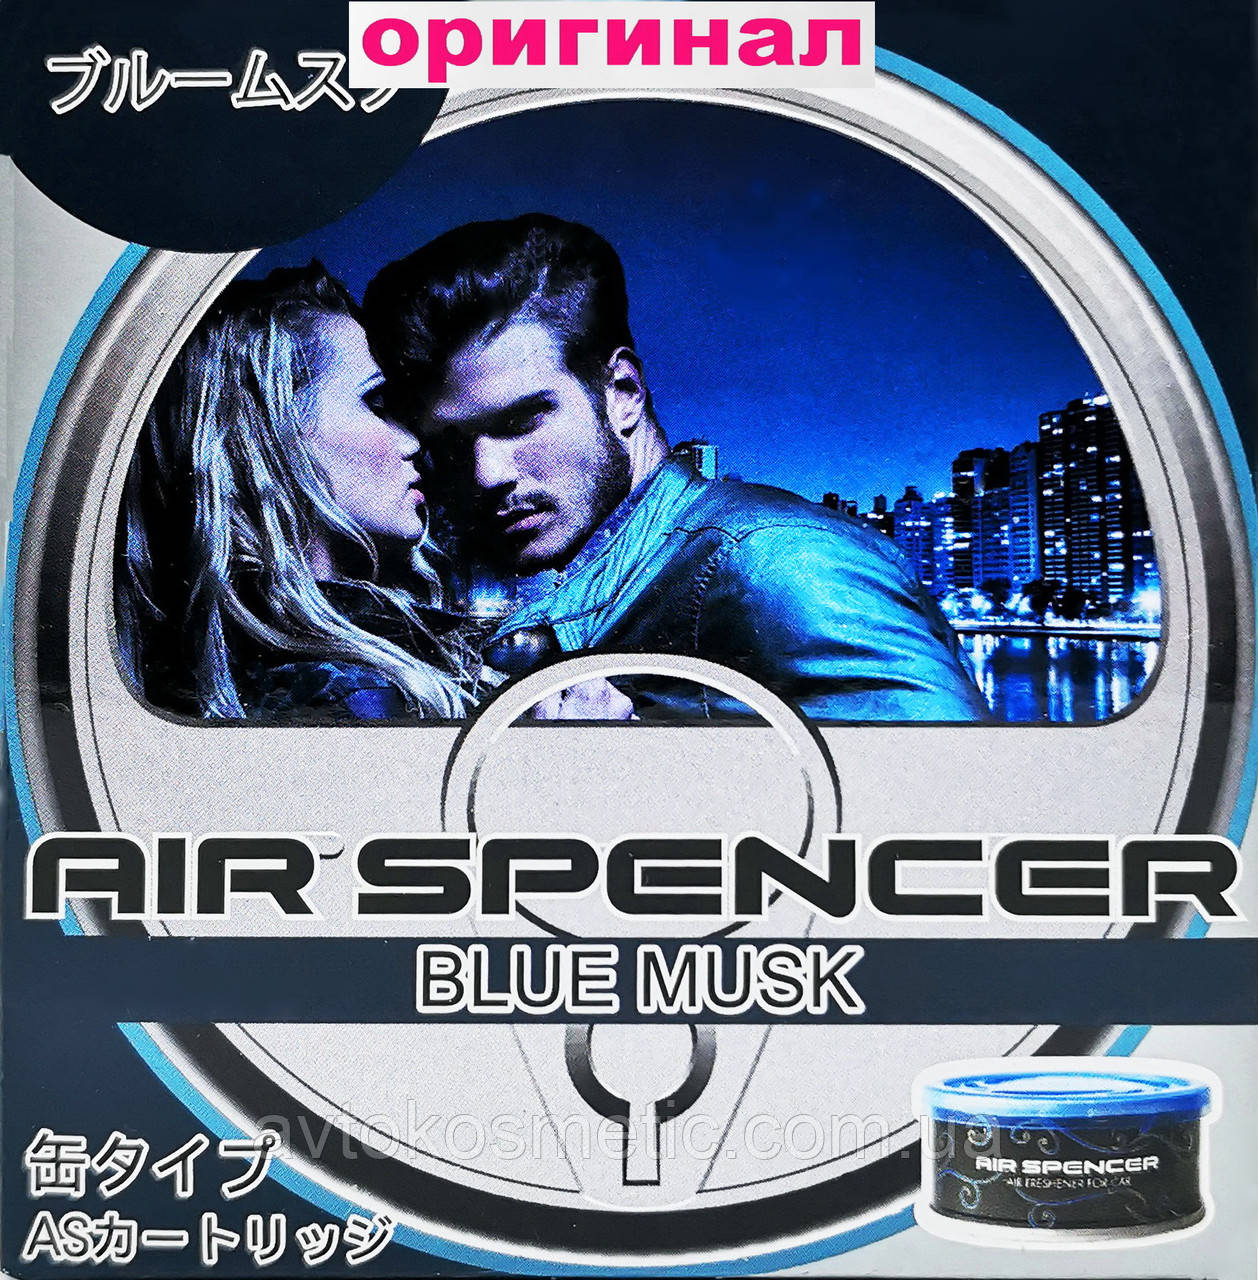 Eikosha Ароматизатор меловой Blue Musk Ледяной шторм